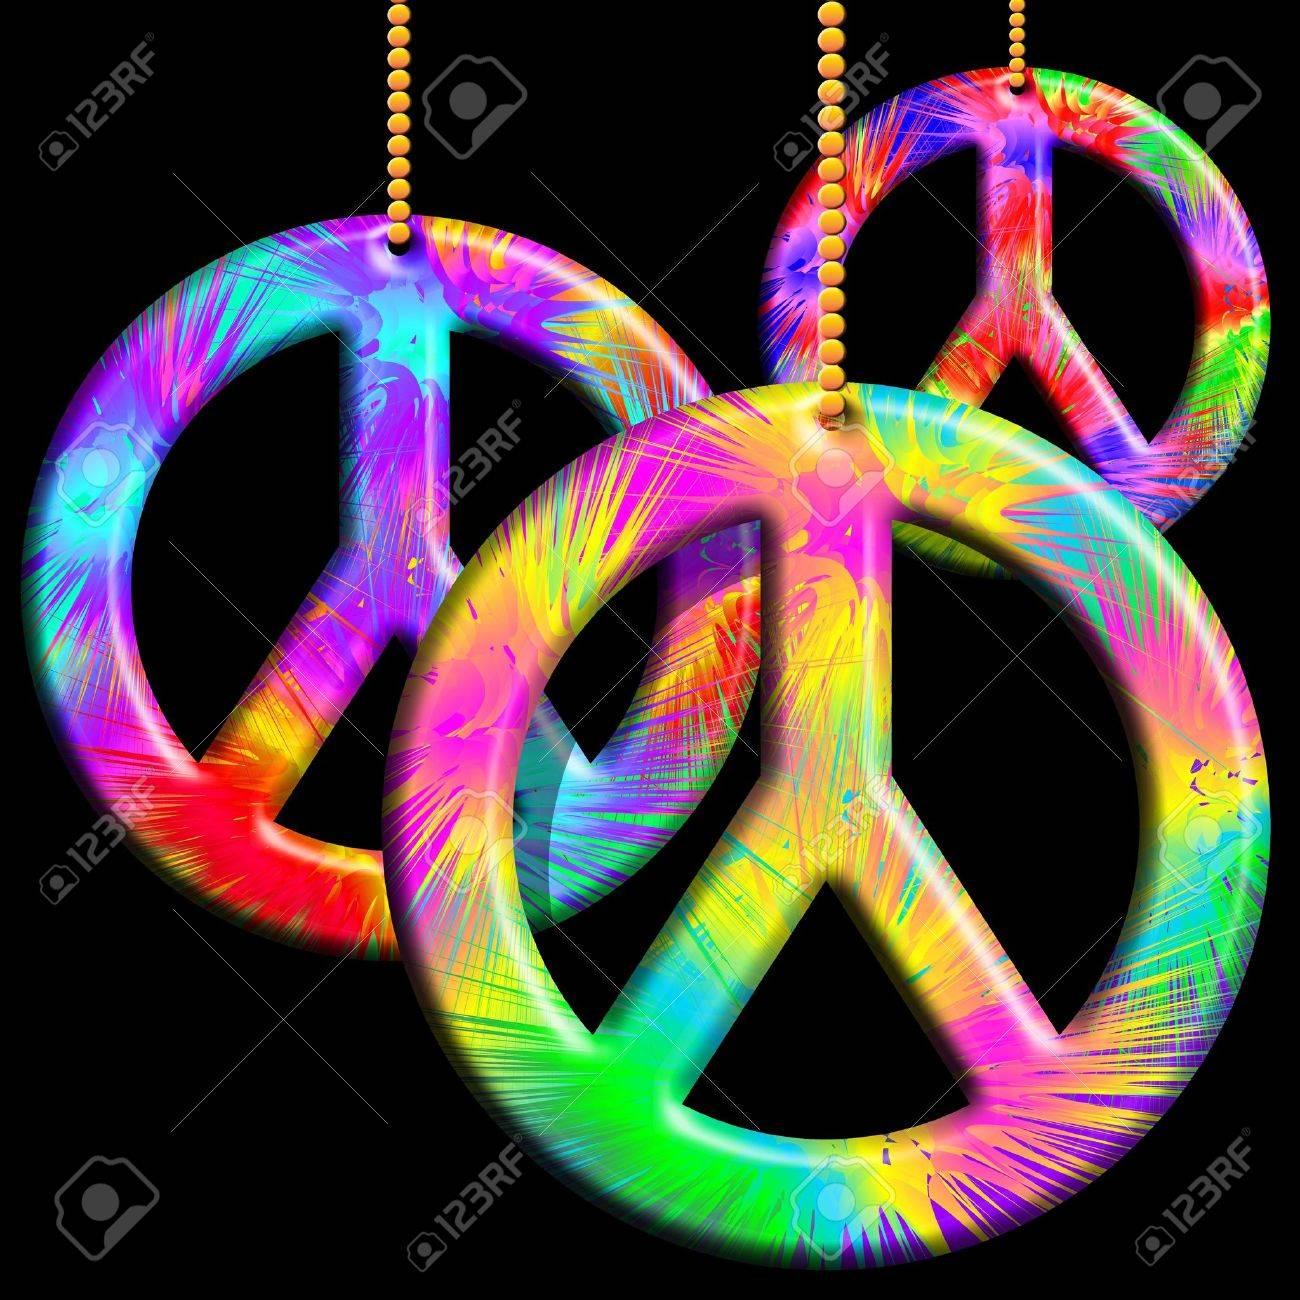 Peace symbols psychedelic ornaments stock photo picture and royalty peace symbols psychedelic ornaments stock photo 15906757 biocorpaavc Images